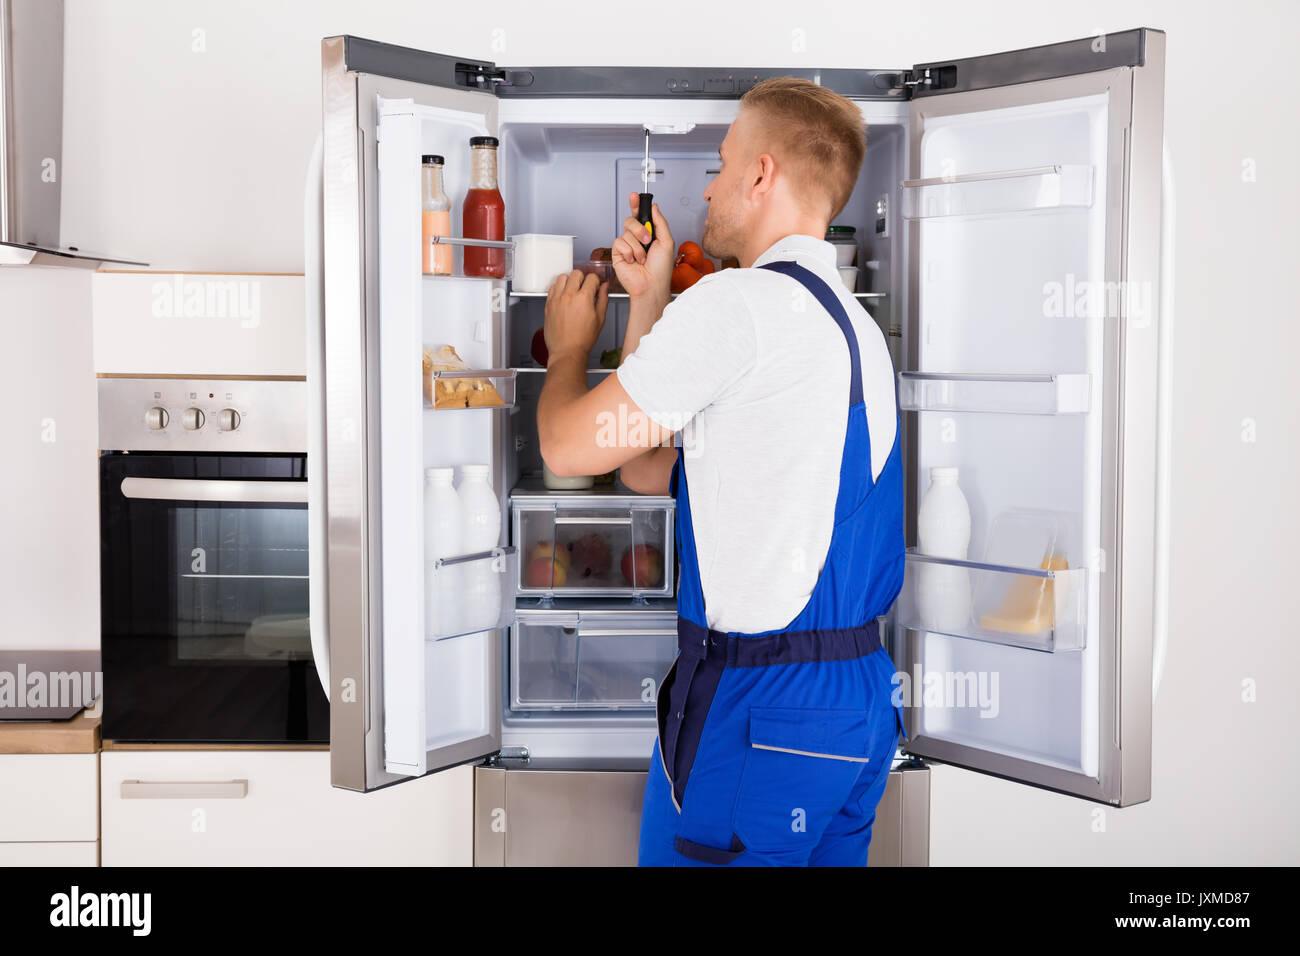 Male Technician Repairing Broken Refrigerator Appliance With Stock Photo Alamy